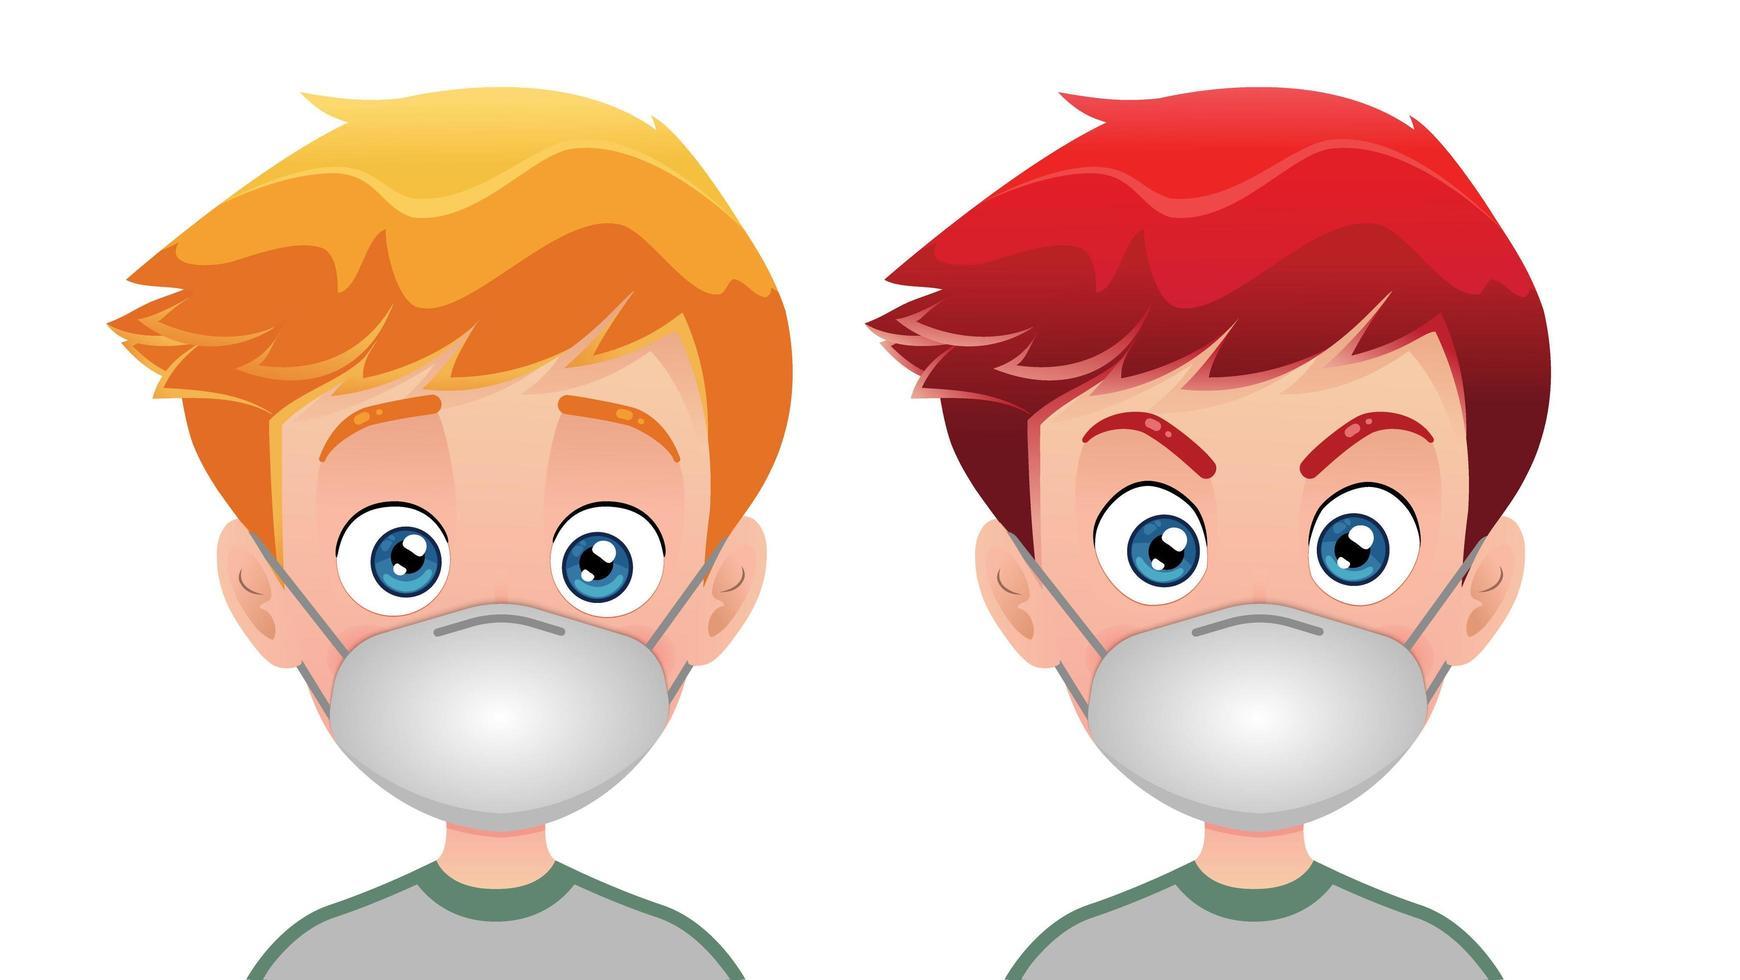 Jungen mit OP-Maske vektor